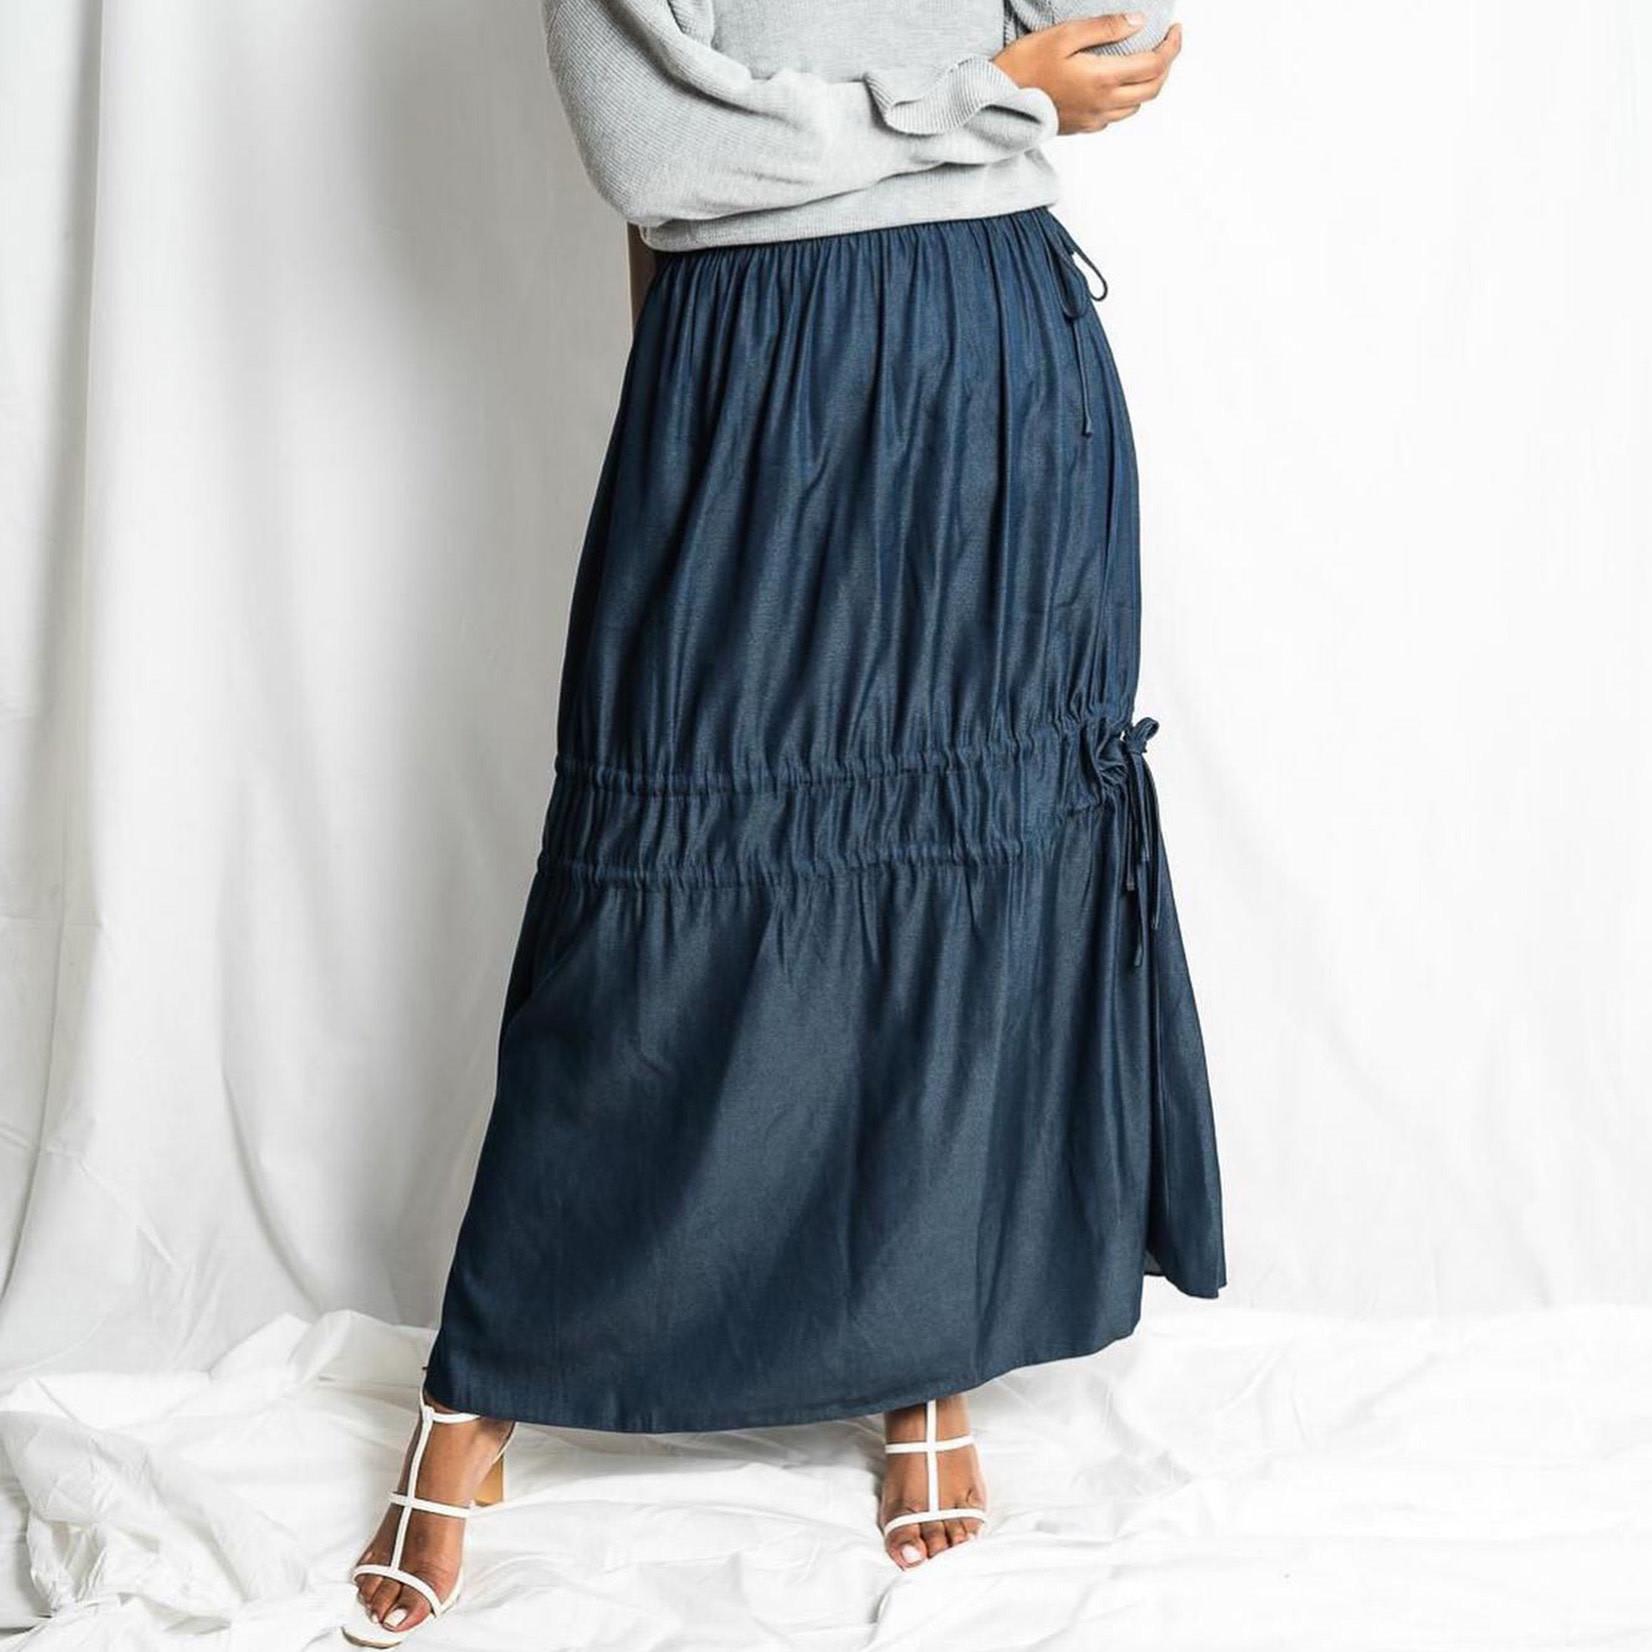 Hijab House Ruched Chambray Skirt